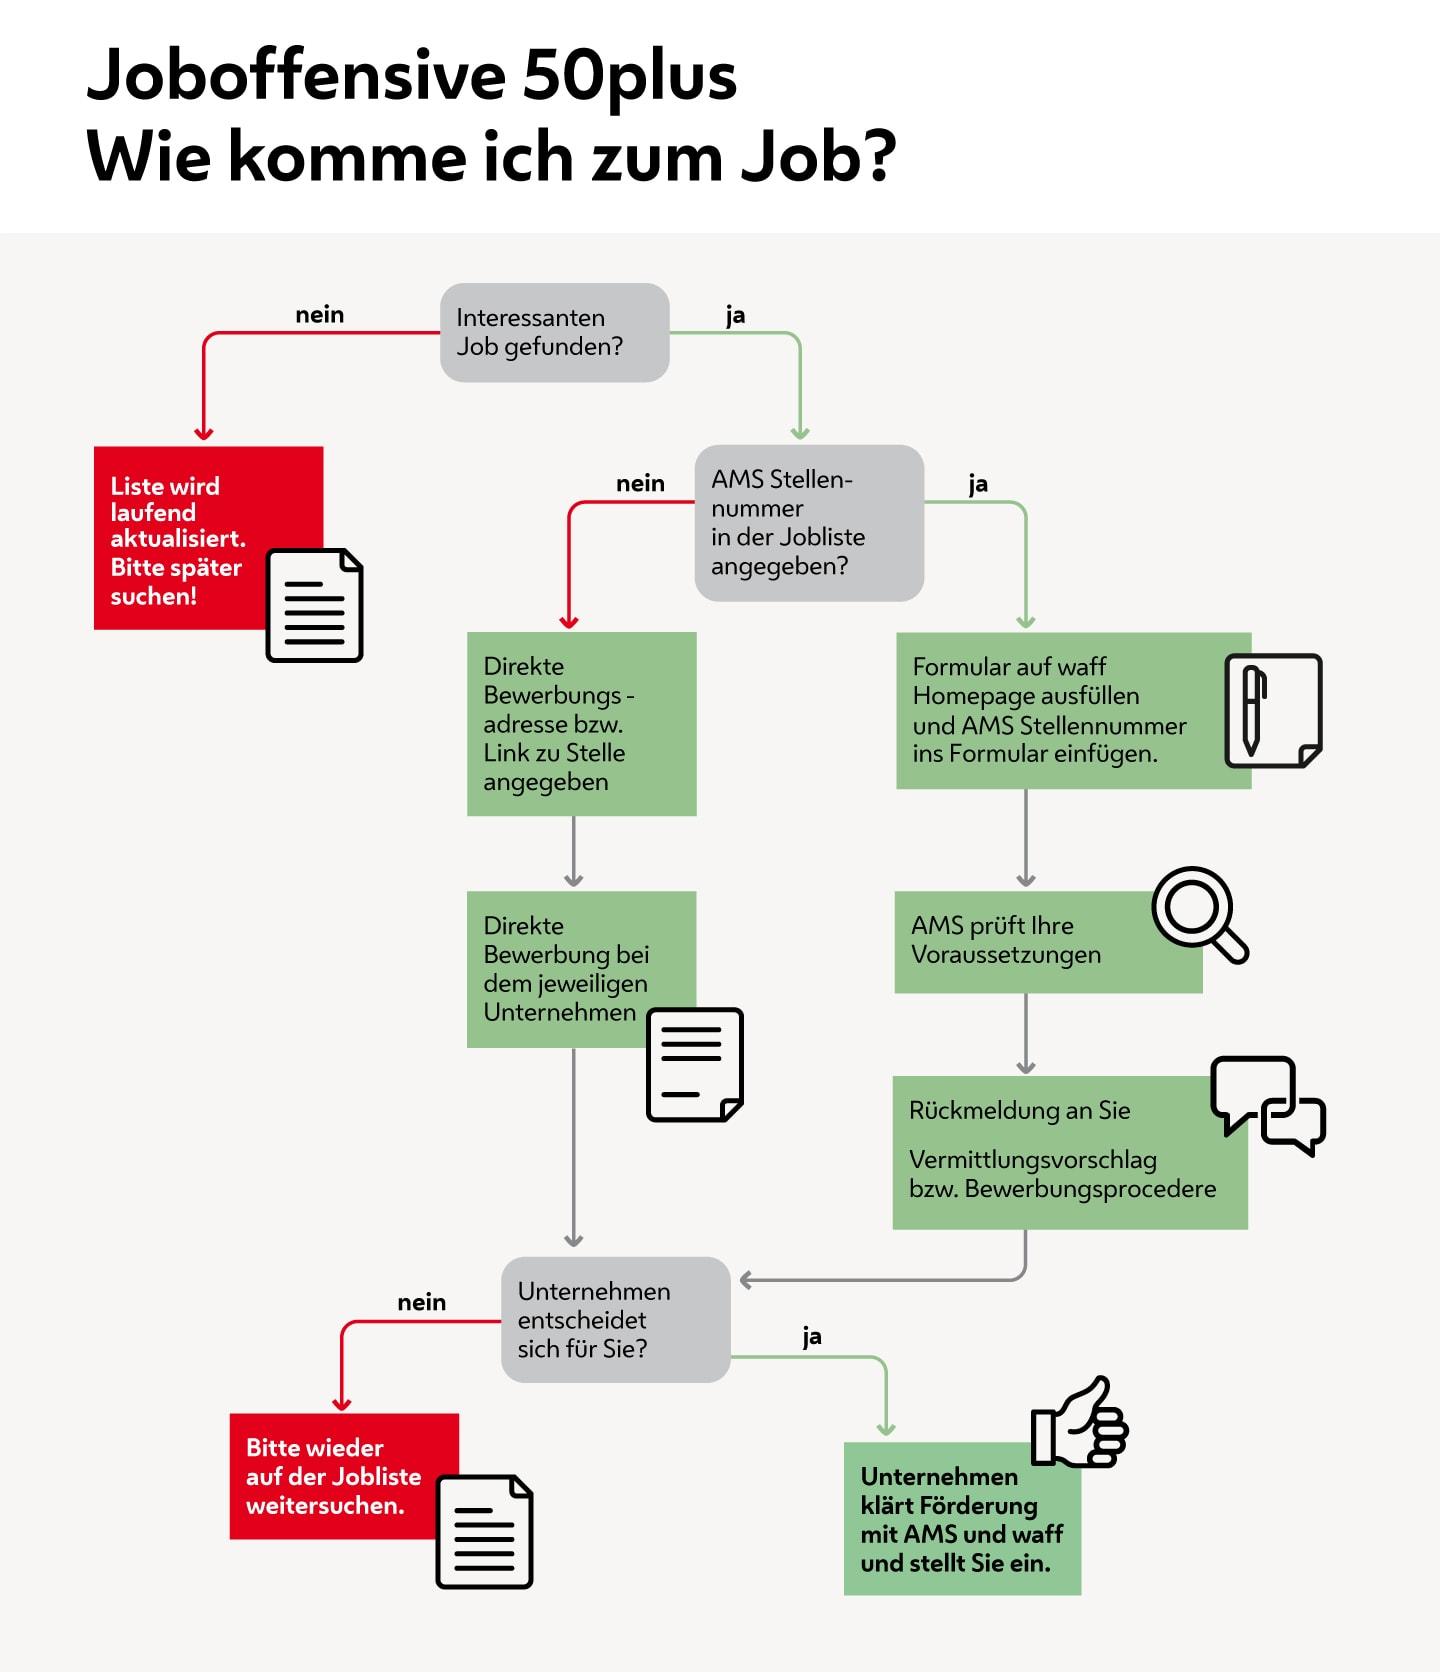 Ablaufgrafik zu Joboffensive 50plus